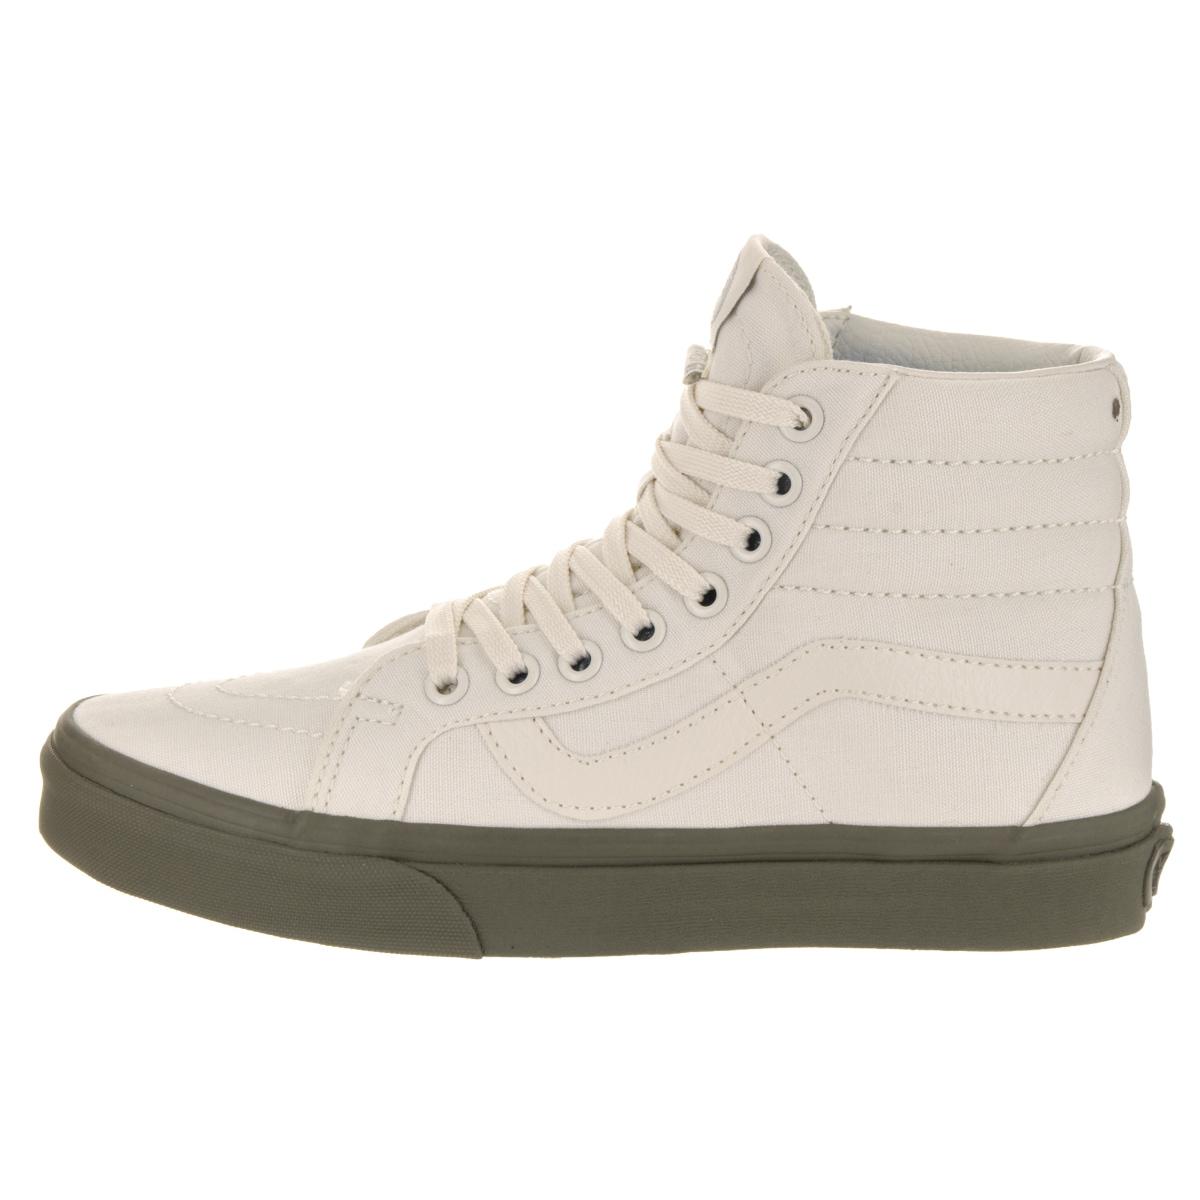 Shop Vans Unisex Sk8-Hi Reissue (Vansguard) White Canvas Skate Shoes - Free  Shipping Today - Overstock.com - 13934407 fff21fafe8